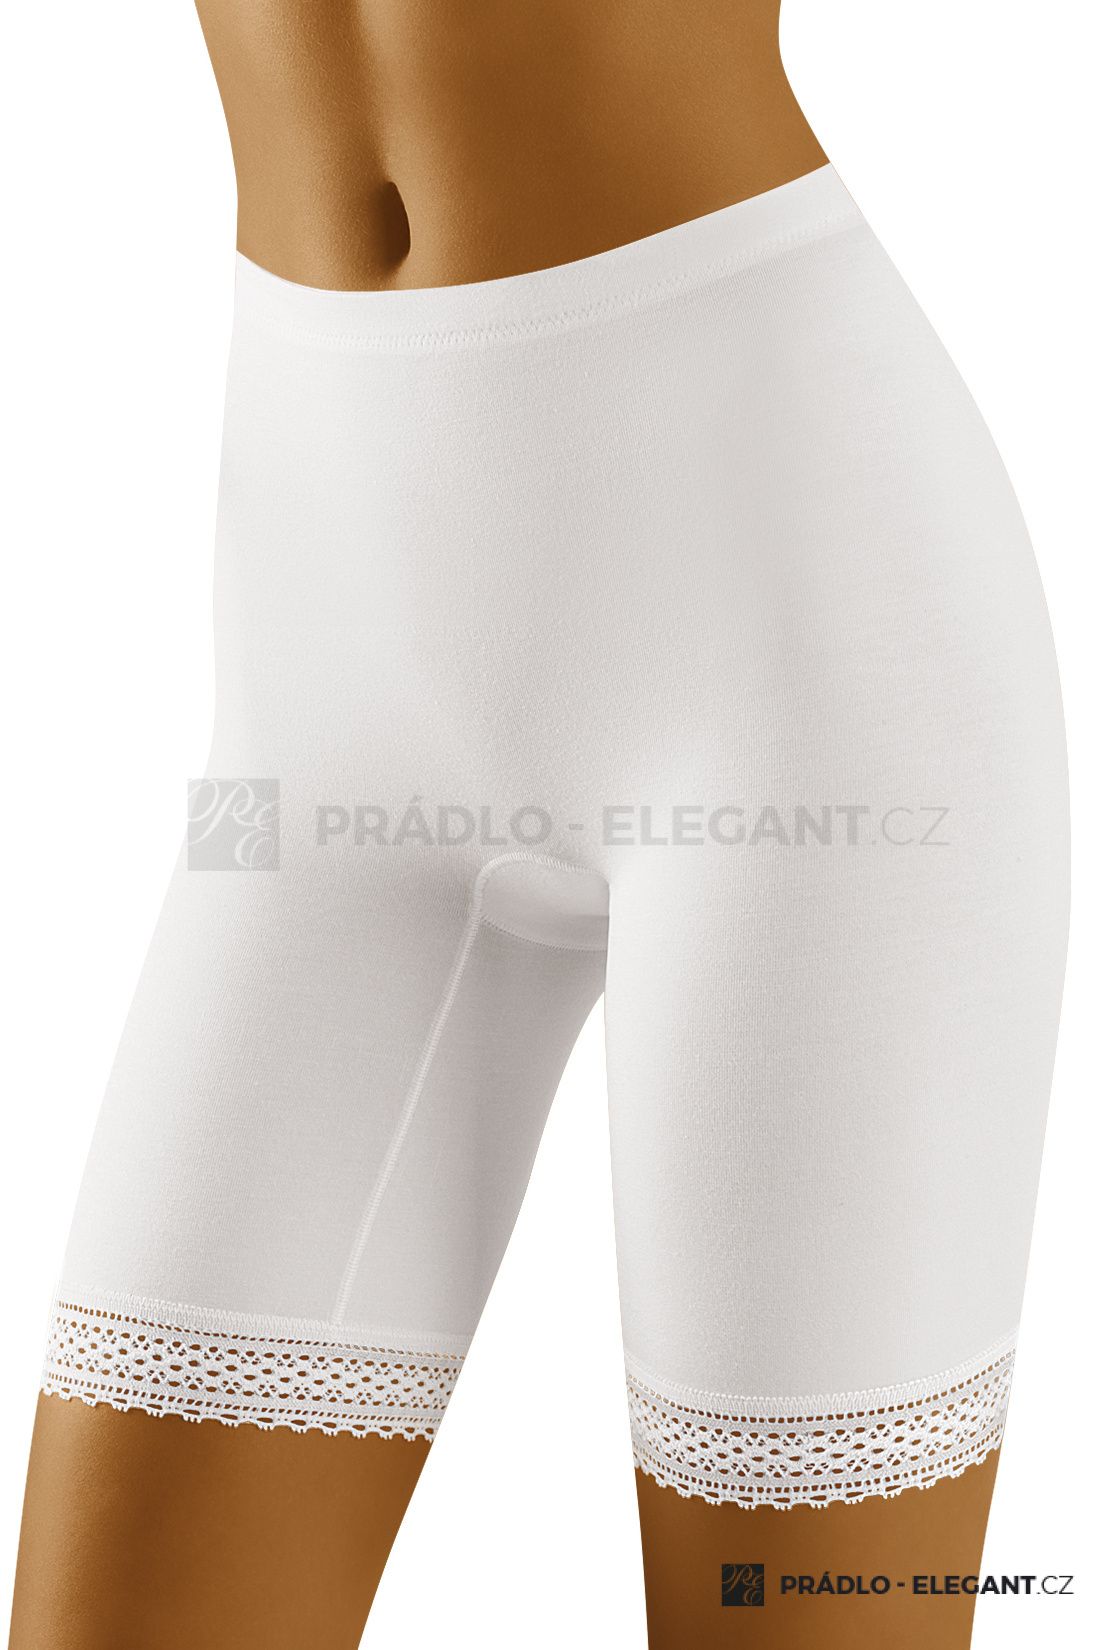 8b338fec5d6 Dámské nohavičkové kalhotky Rona bílé - ELEGANT.cz